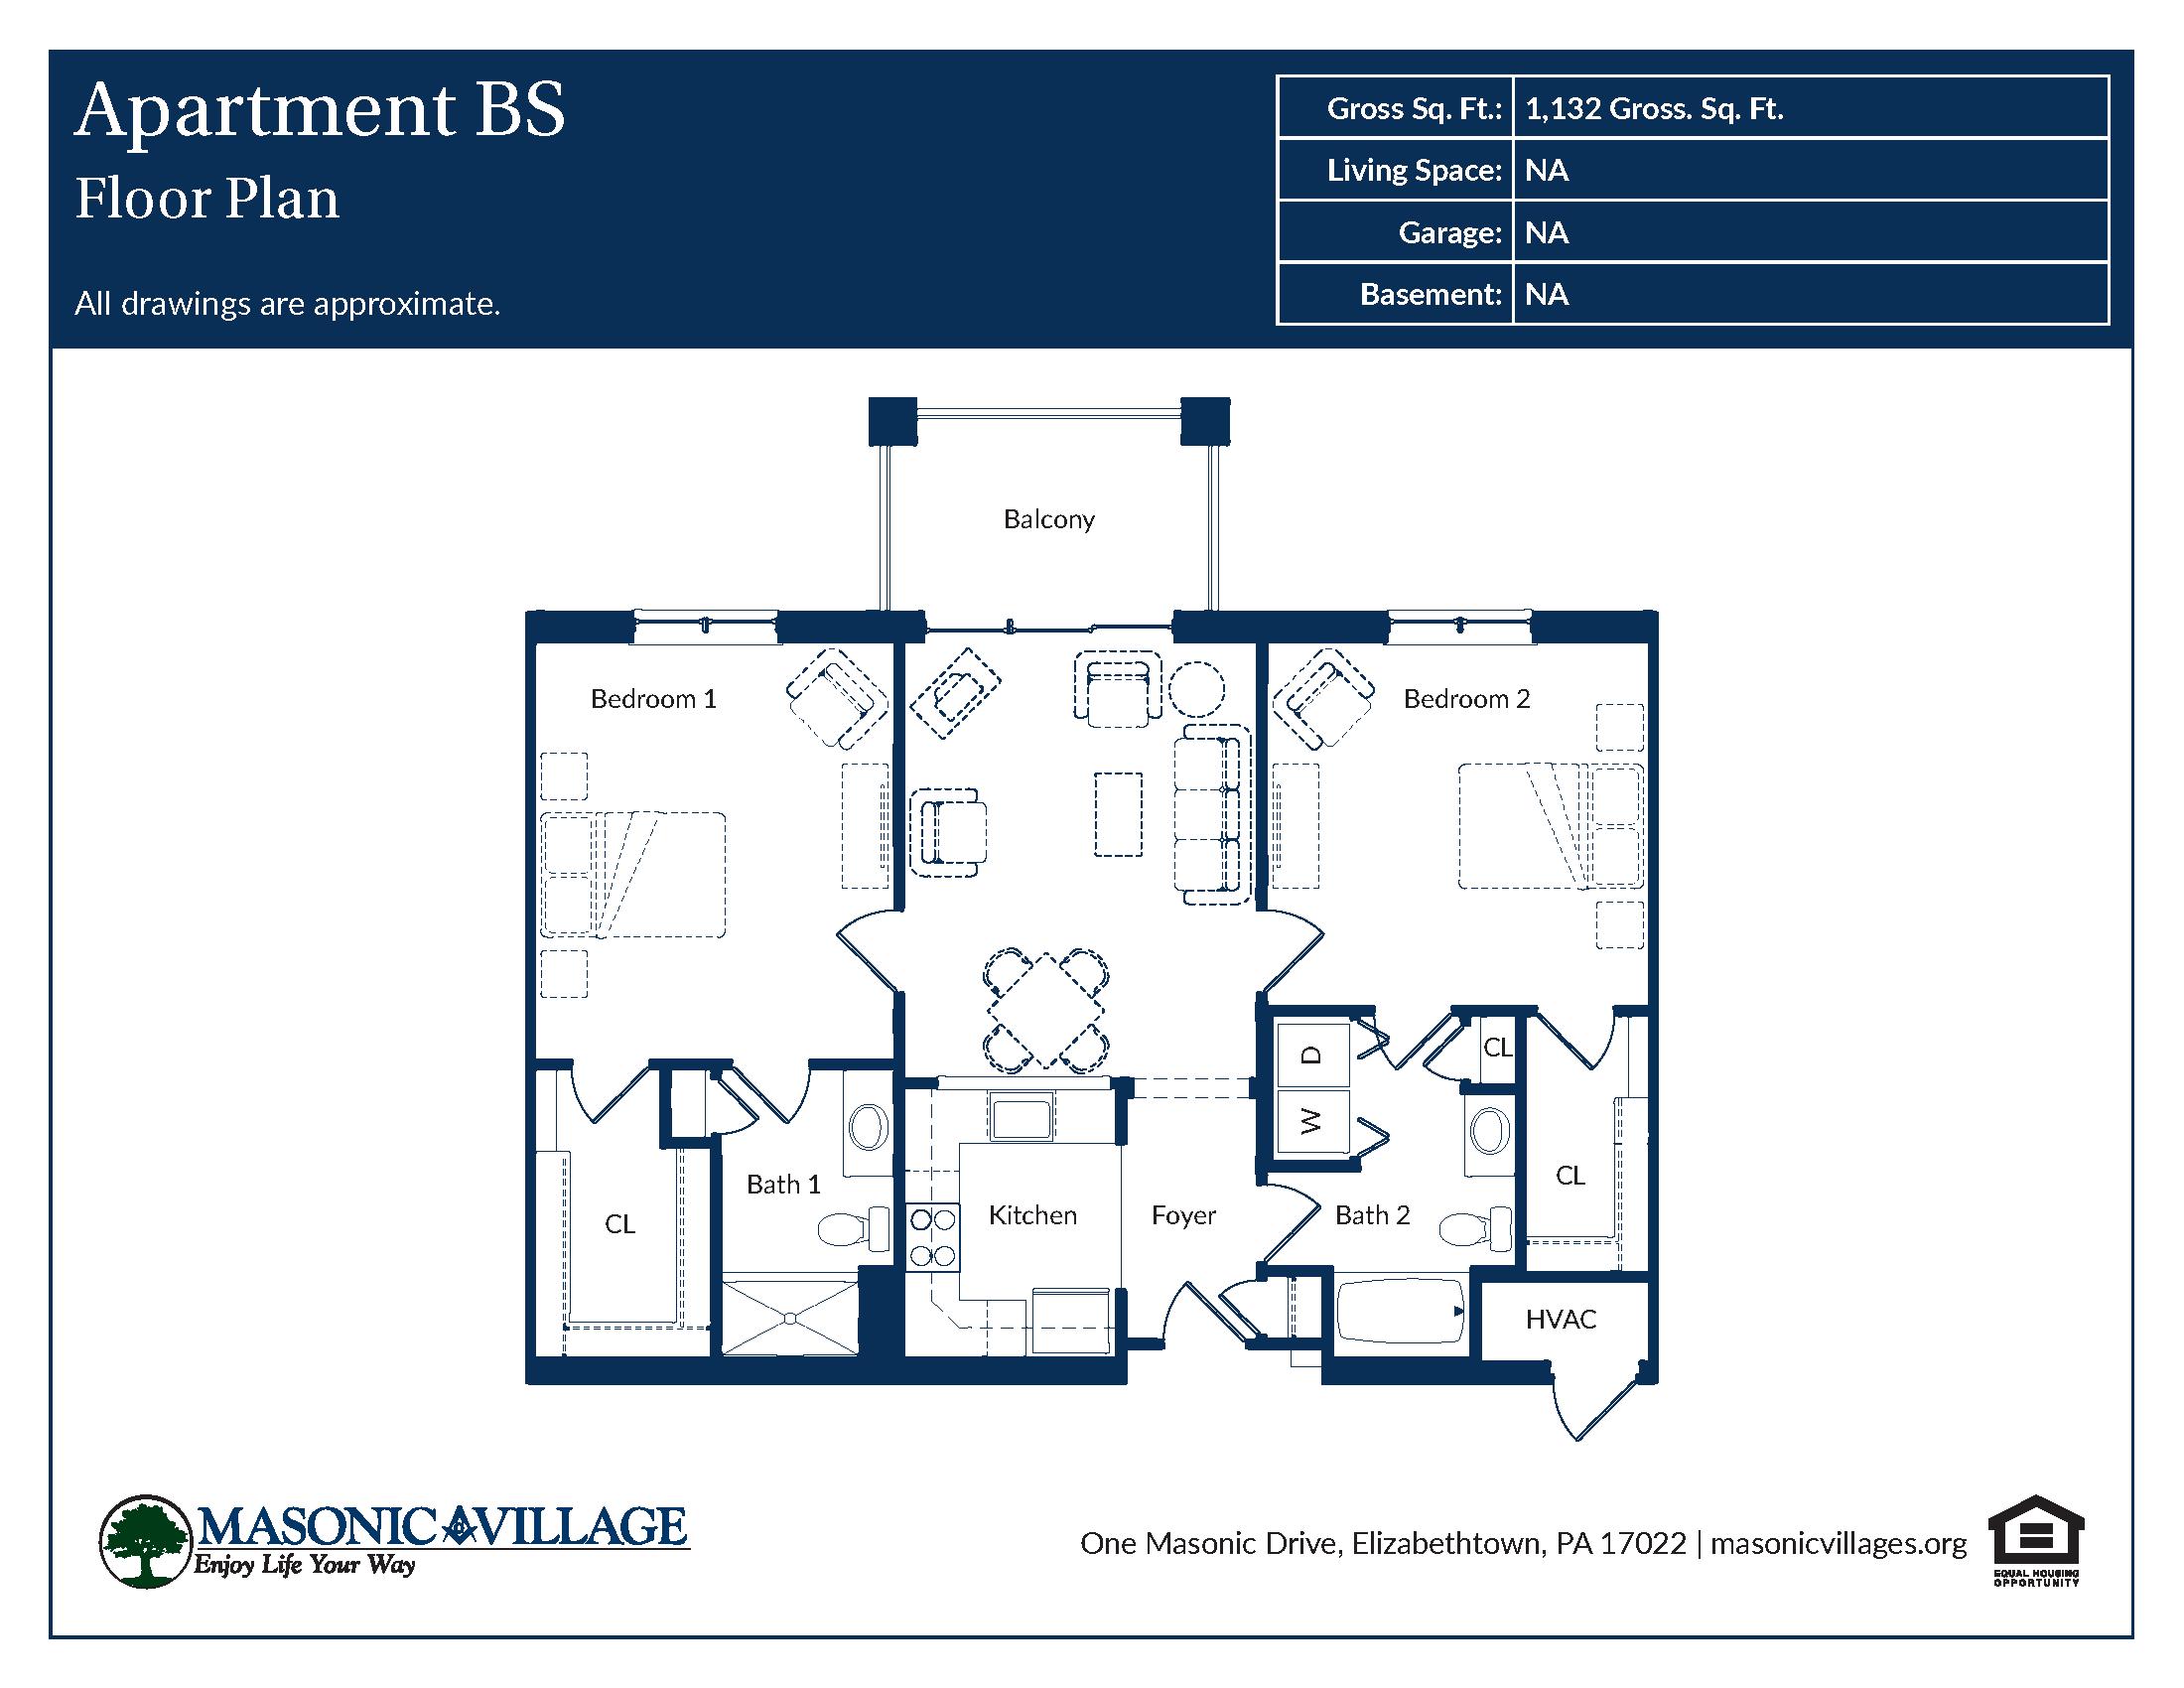 Masonic Village at Elizabethtown - Apartment BS Floor Plan